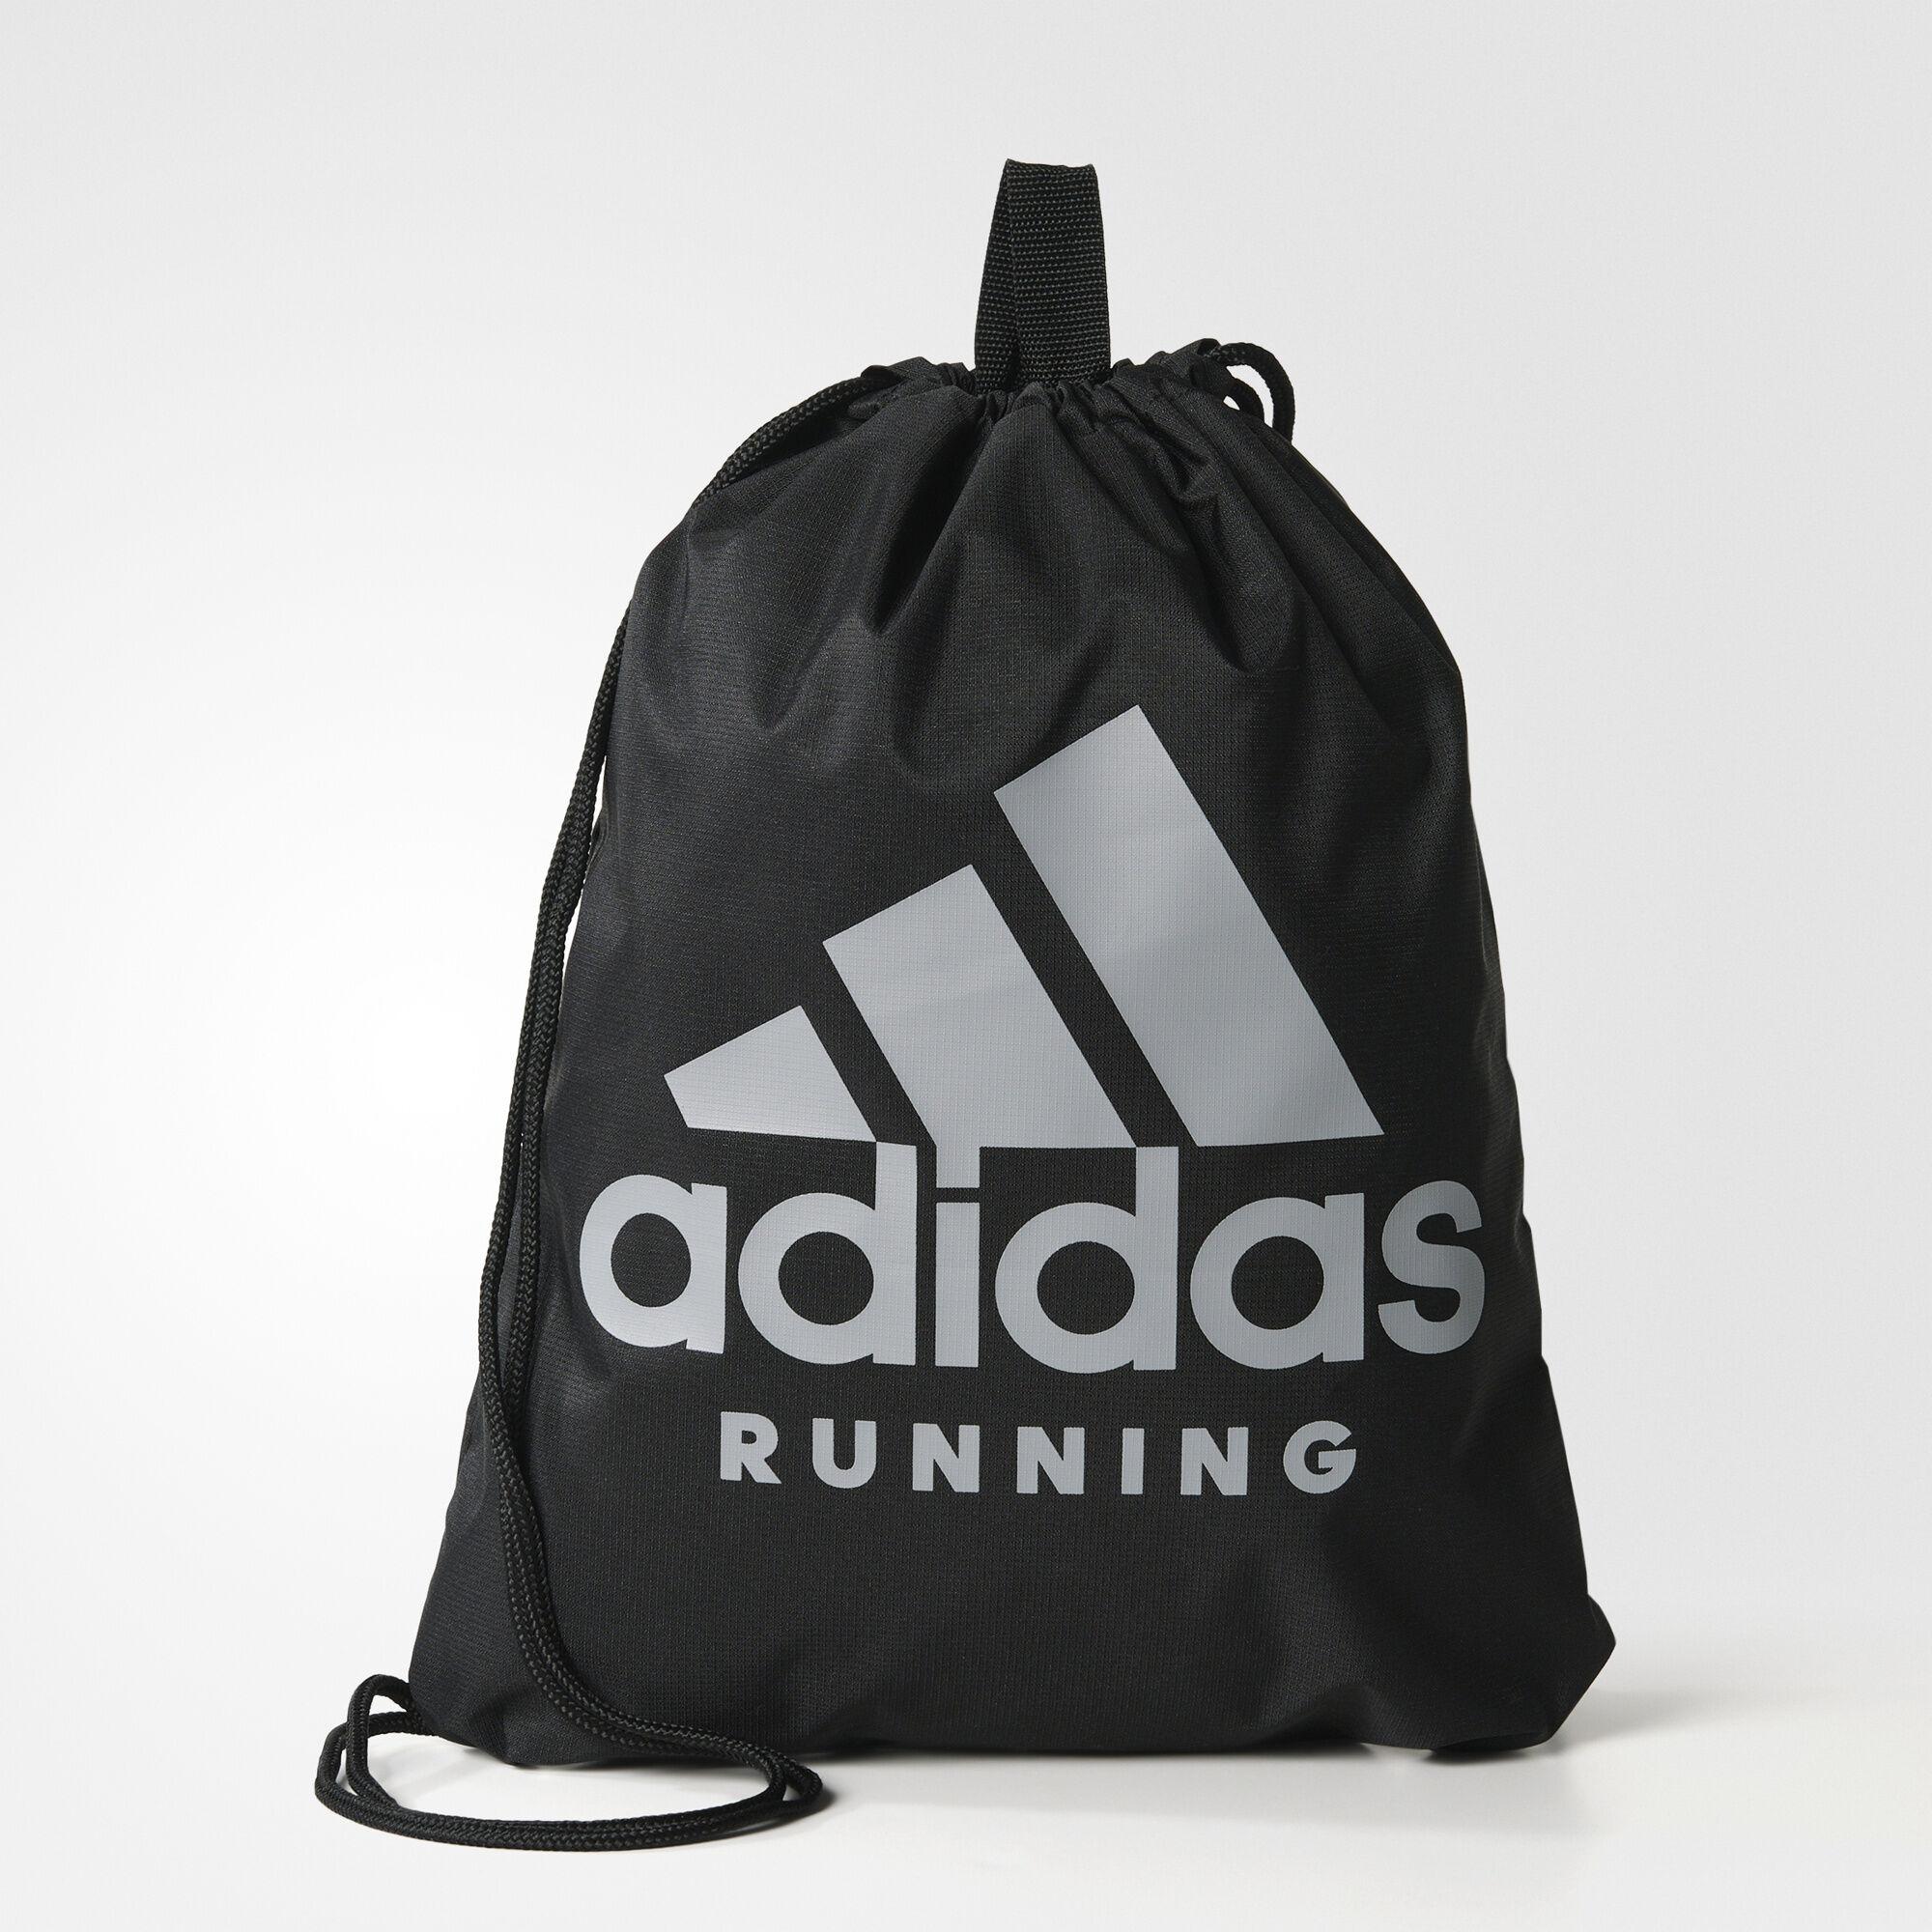 Buy adidas gym bag black   OFF79% Discounted b822e264bfa3d